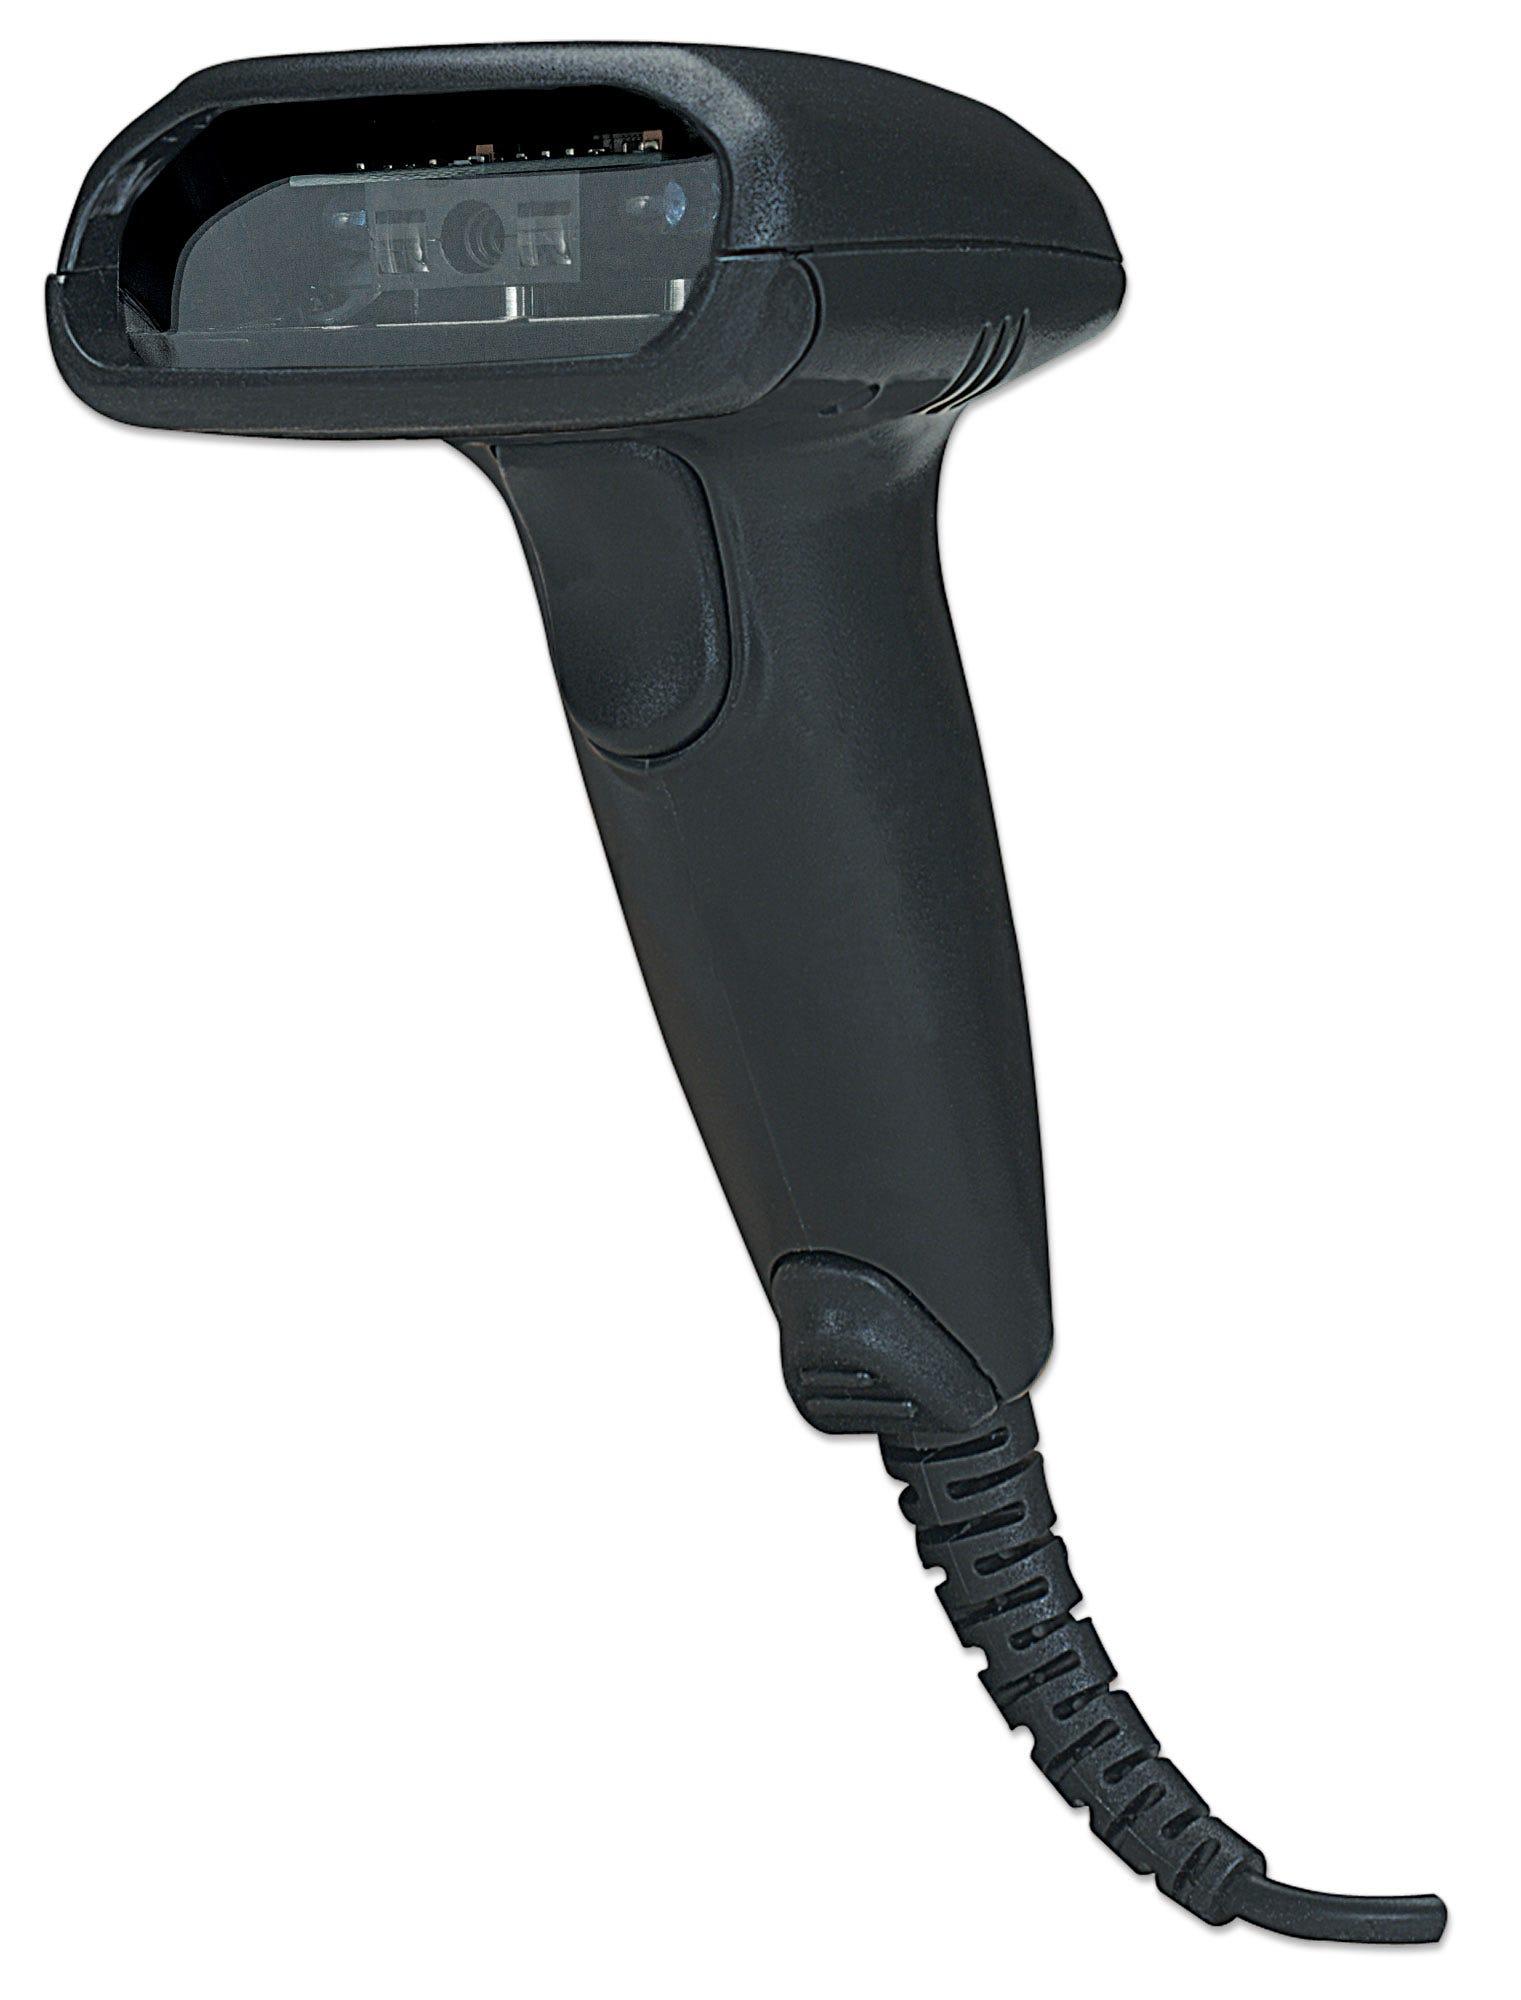 Manhattan Long Range CCD Handheld Barcode Scanner, USB, 500mm Scan Depth, Cable 1.5m, Max Ambient Light 10,000 lux (sunlight), Black, Box